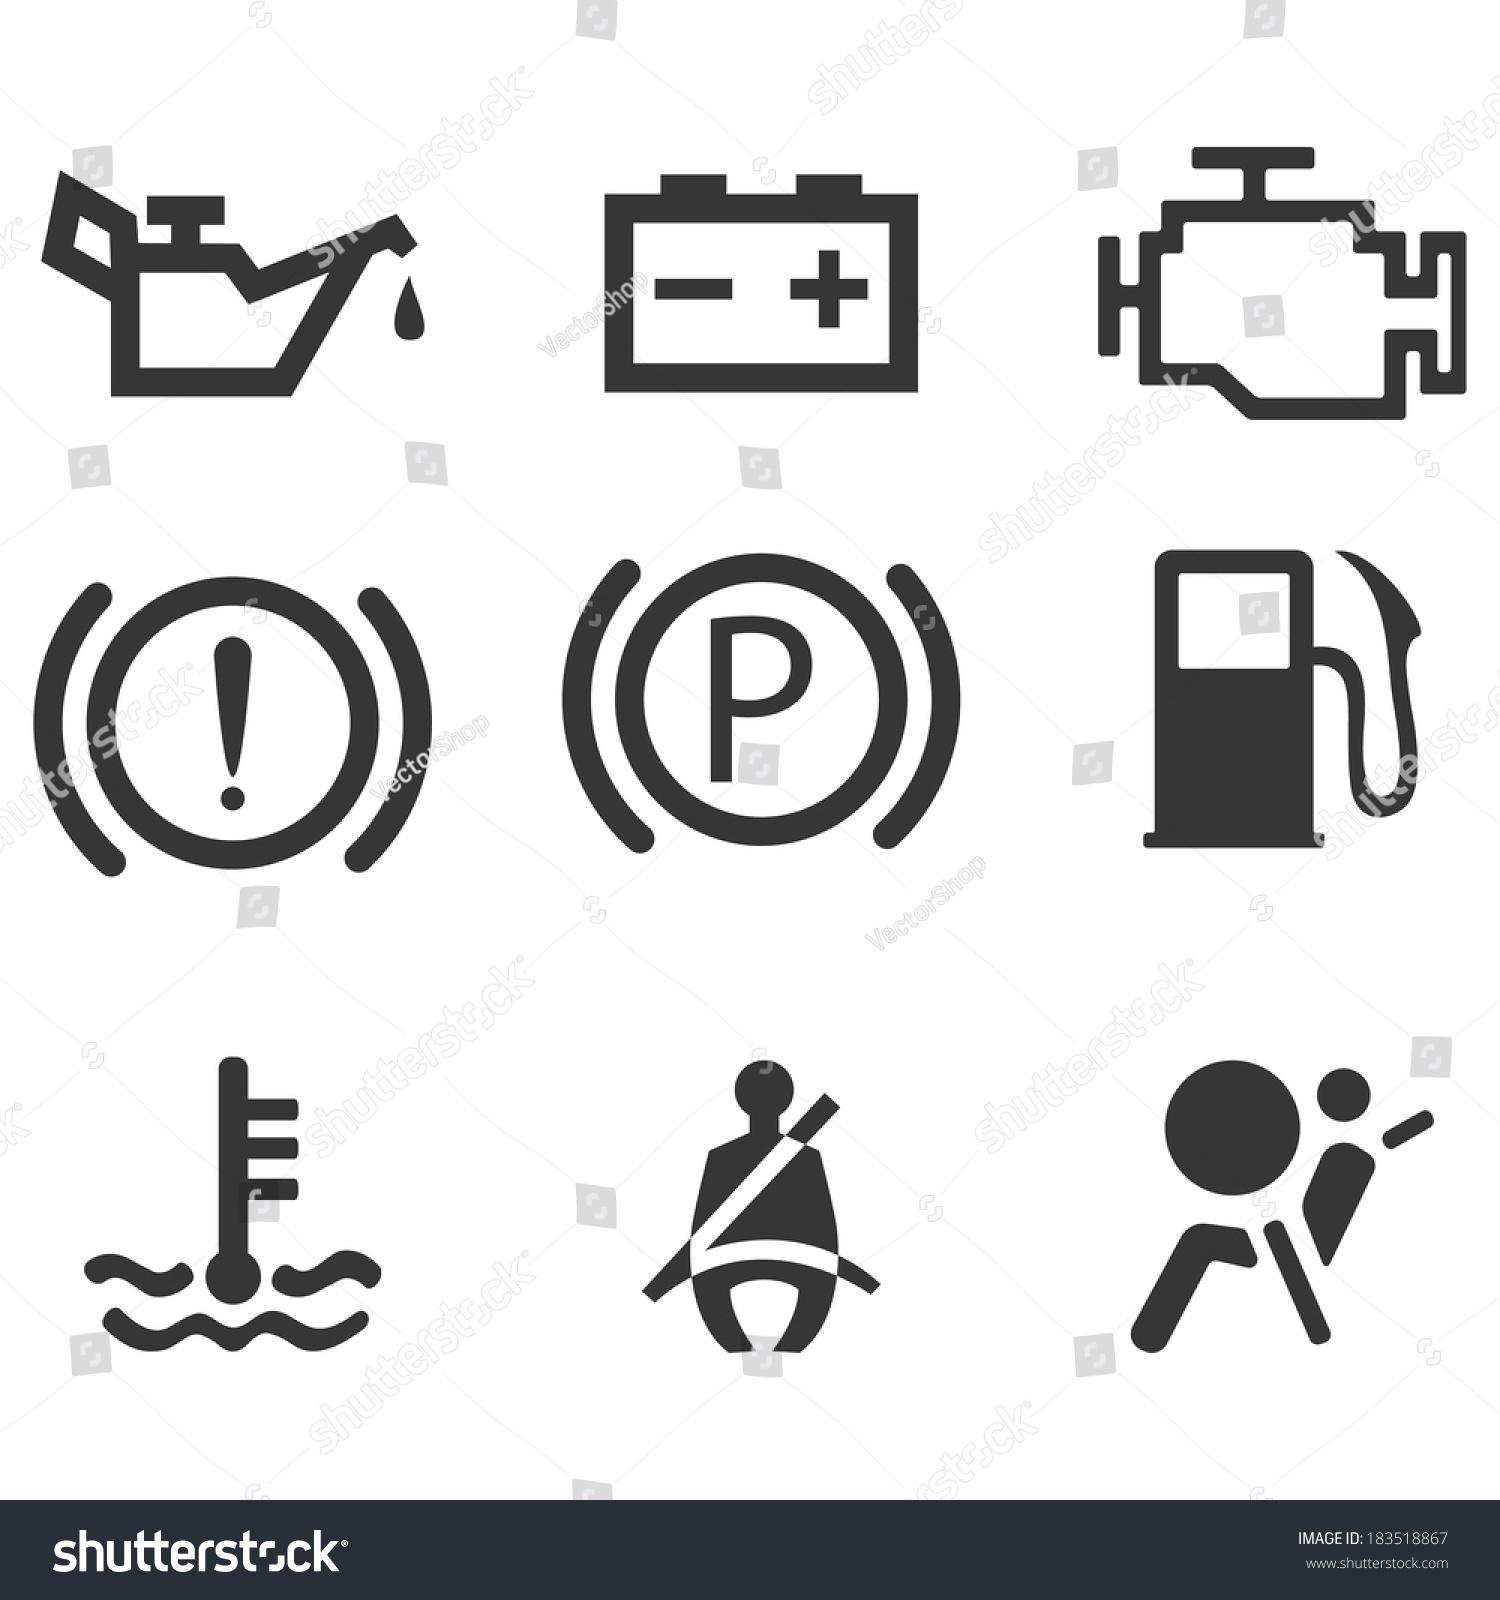 Car Interface Symbols Icon Set Car Stock Vector 2018 183518867